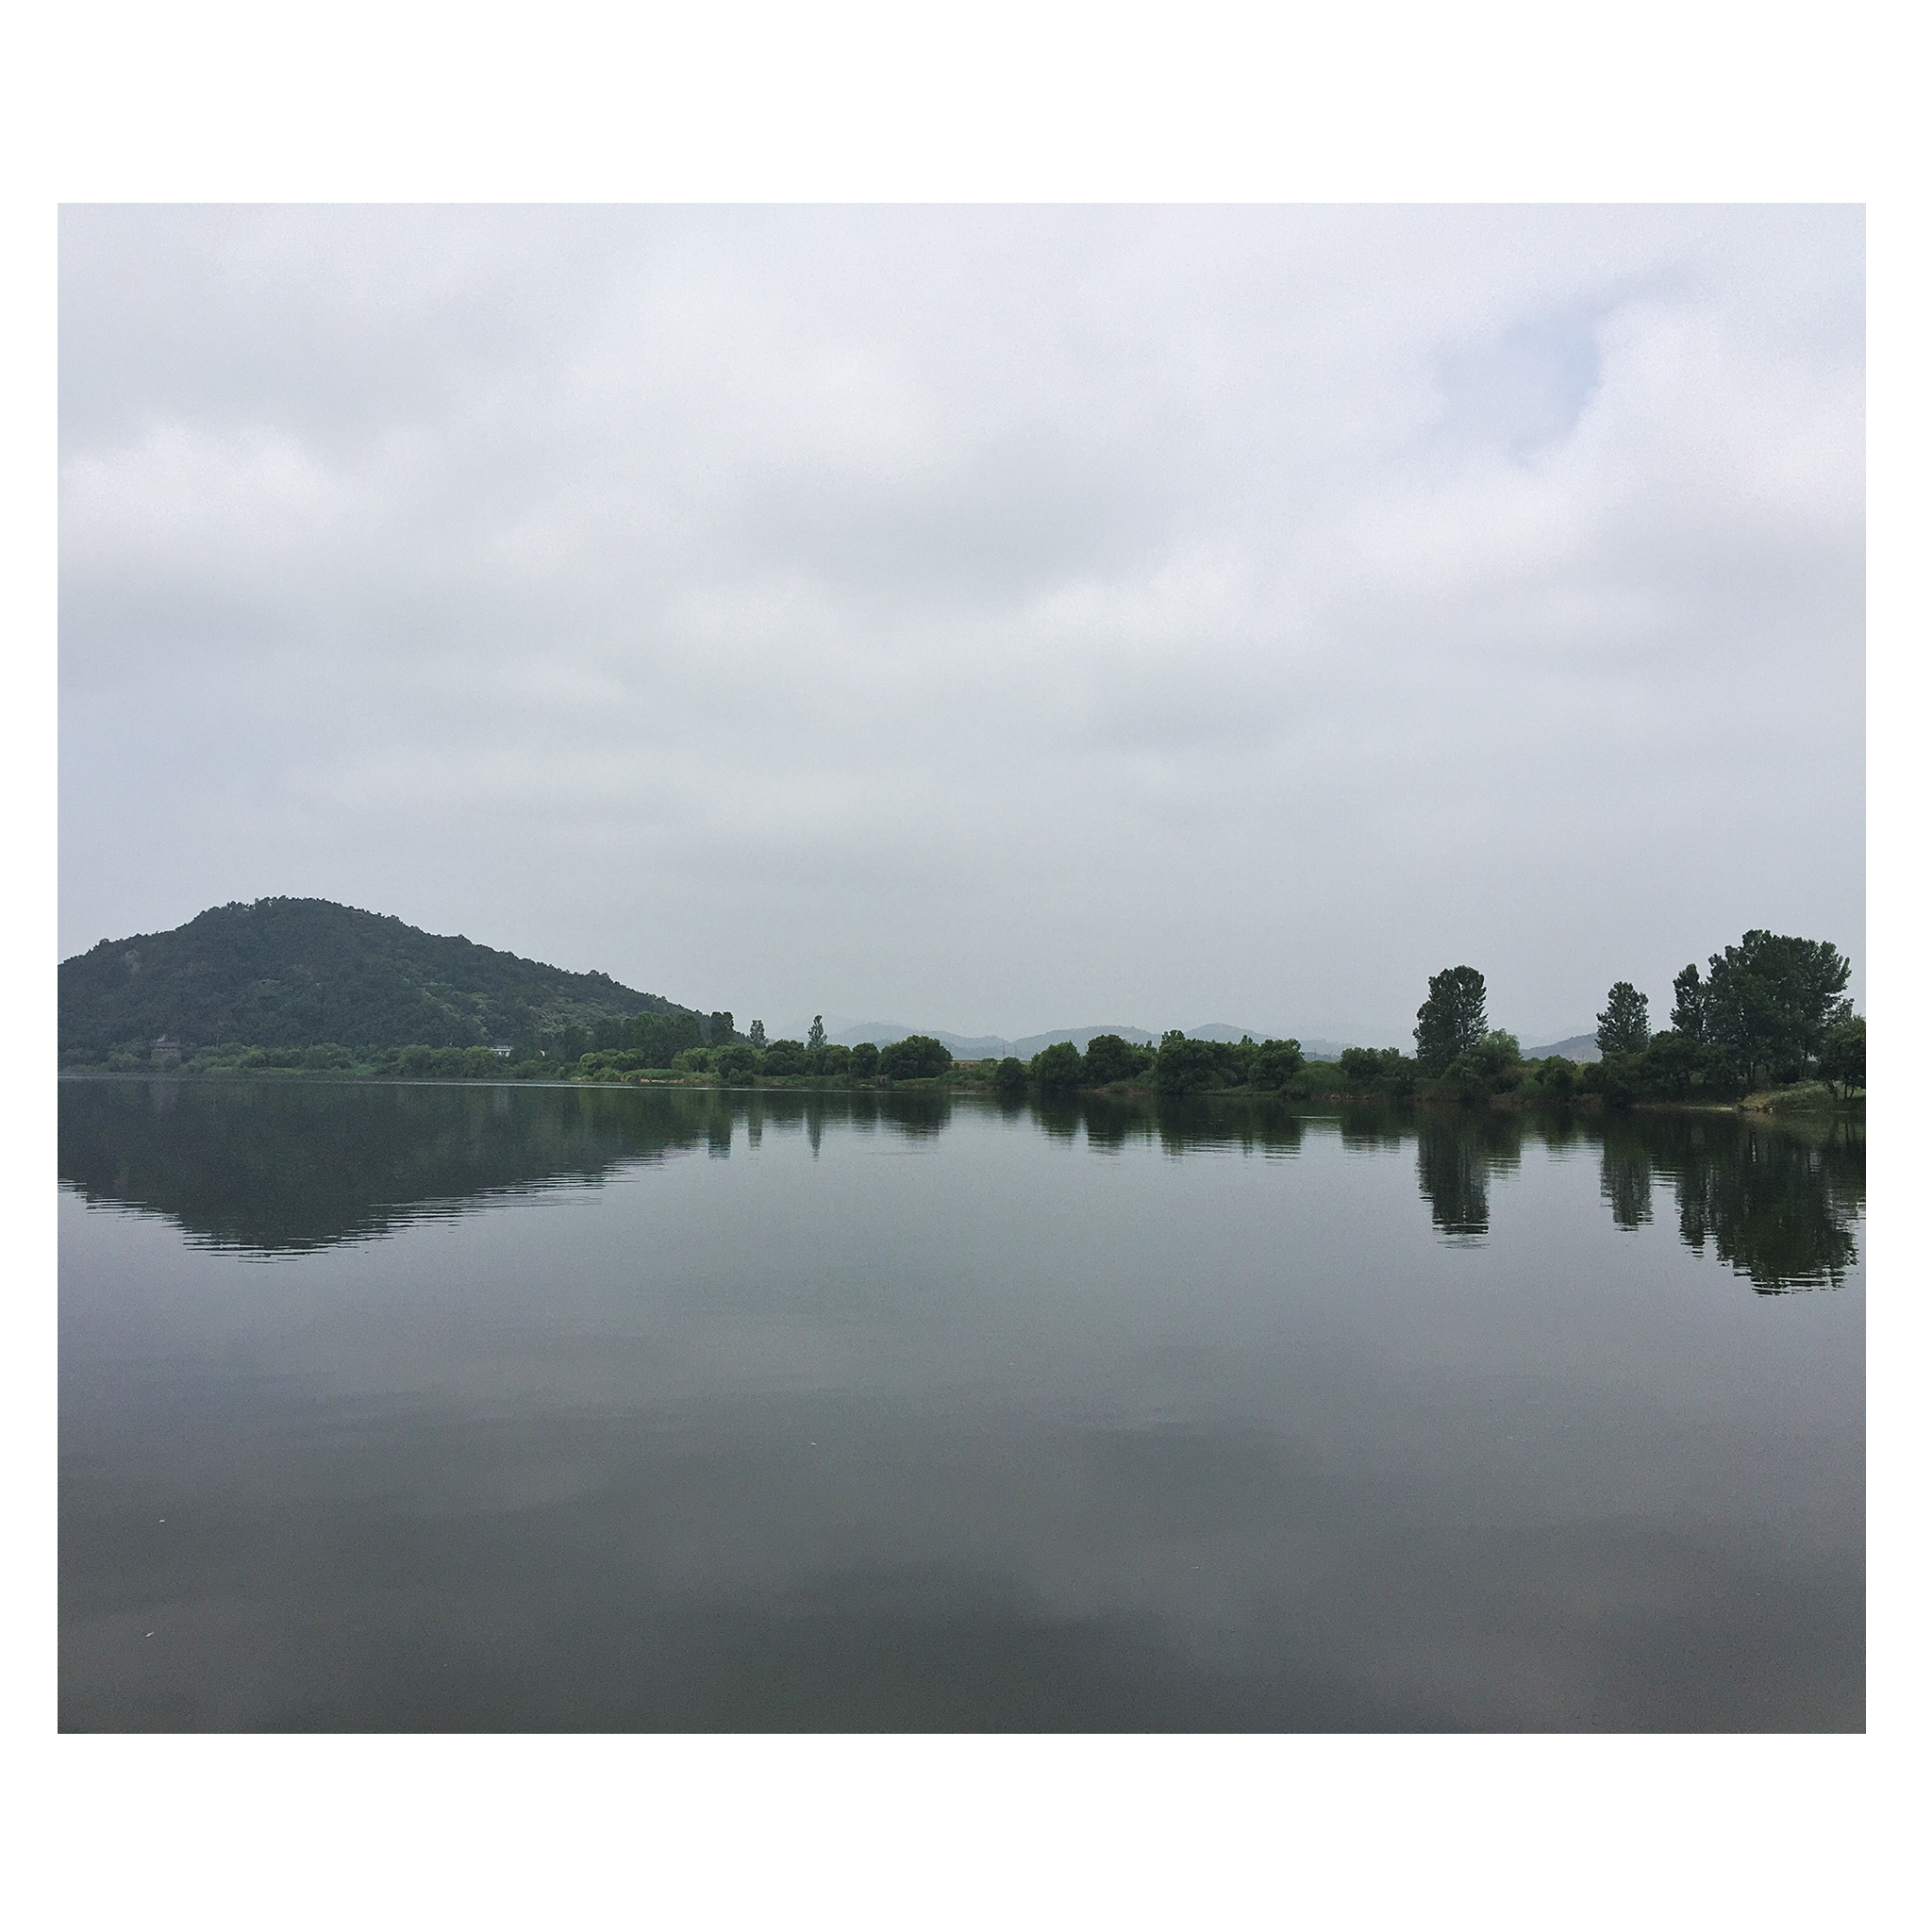 paysage coréen